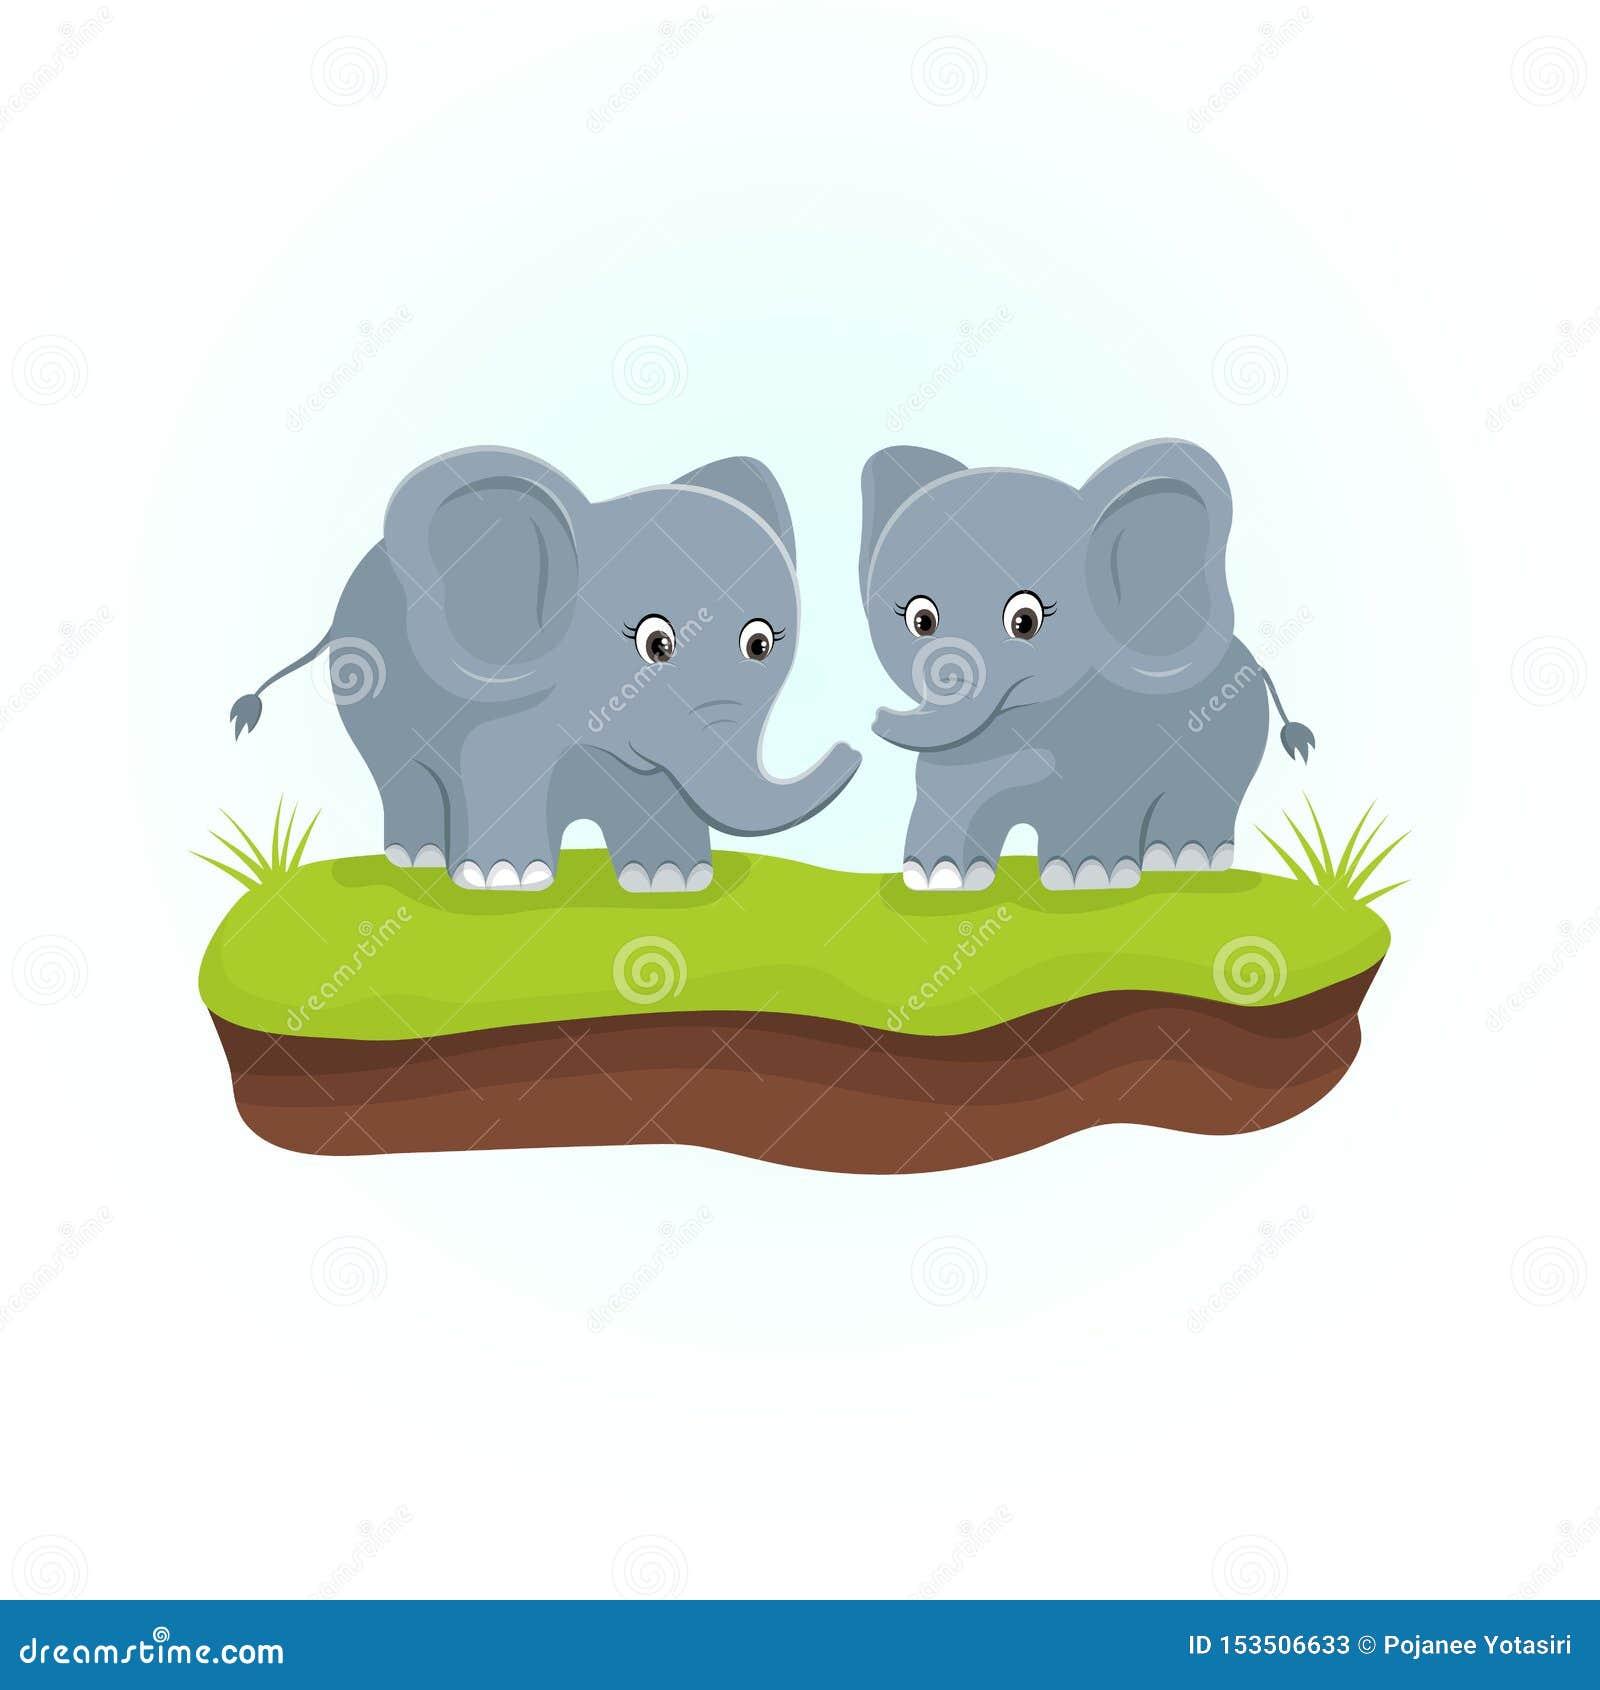 Cute Elephants on the green grasses. Animals cartoon character.